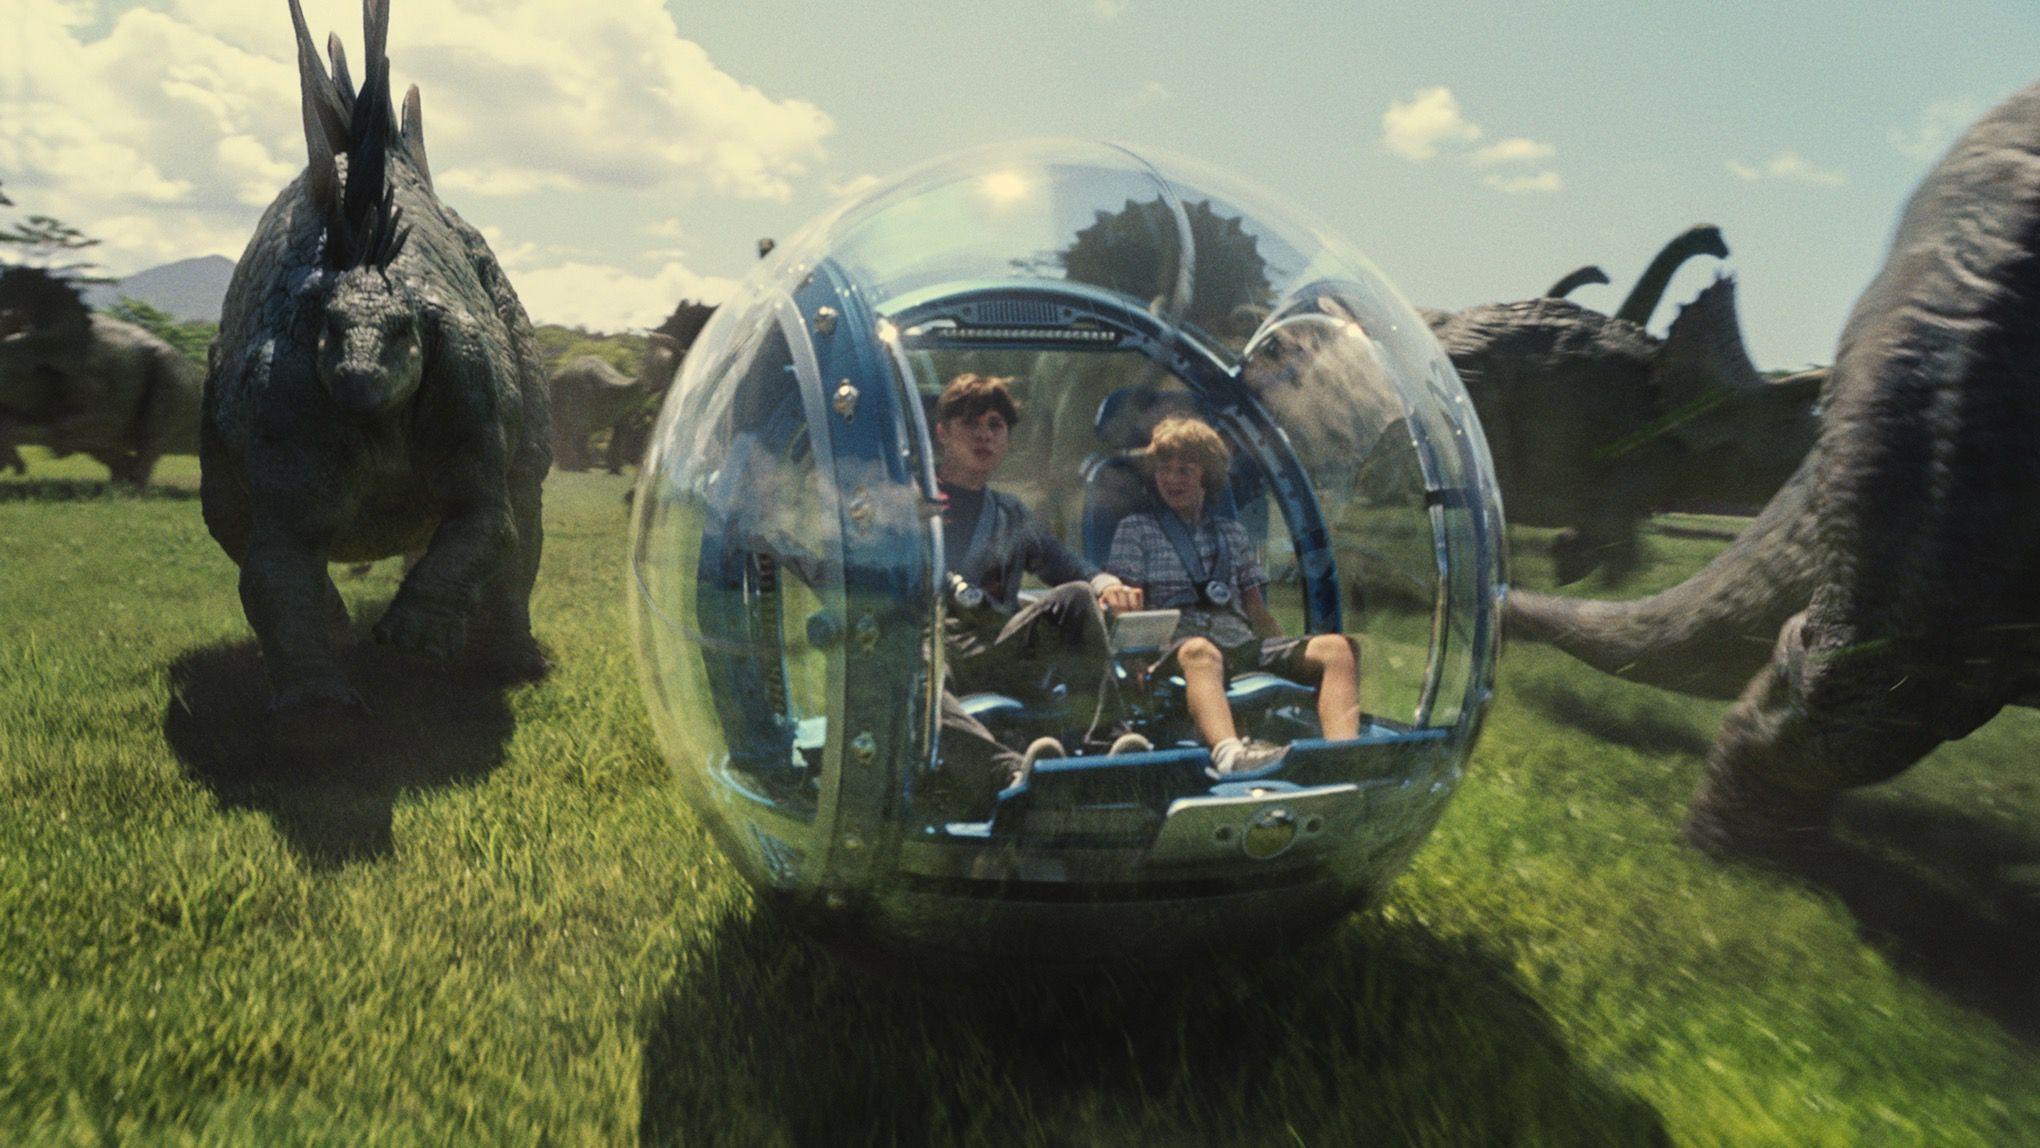 Jurassic World promotional images (UNIVERSAL)